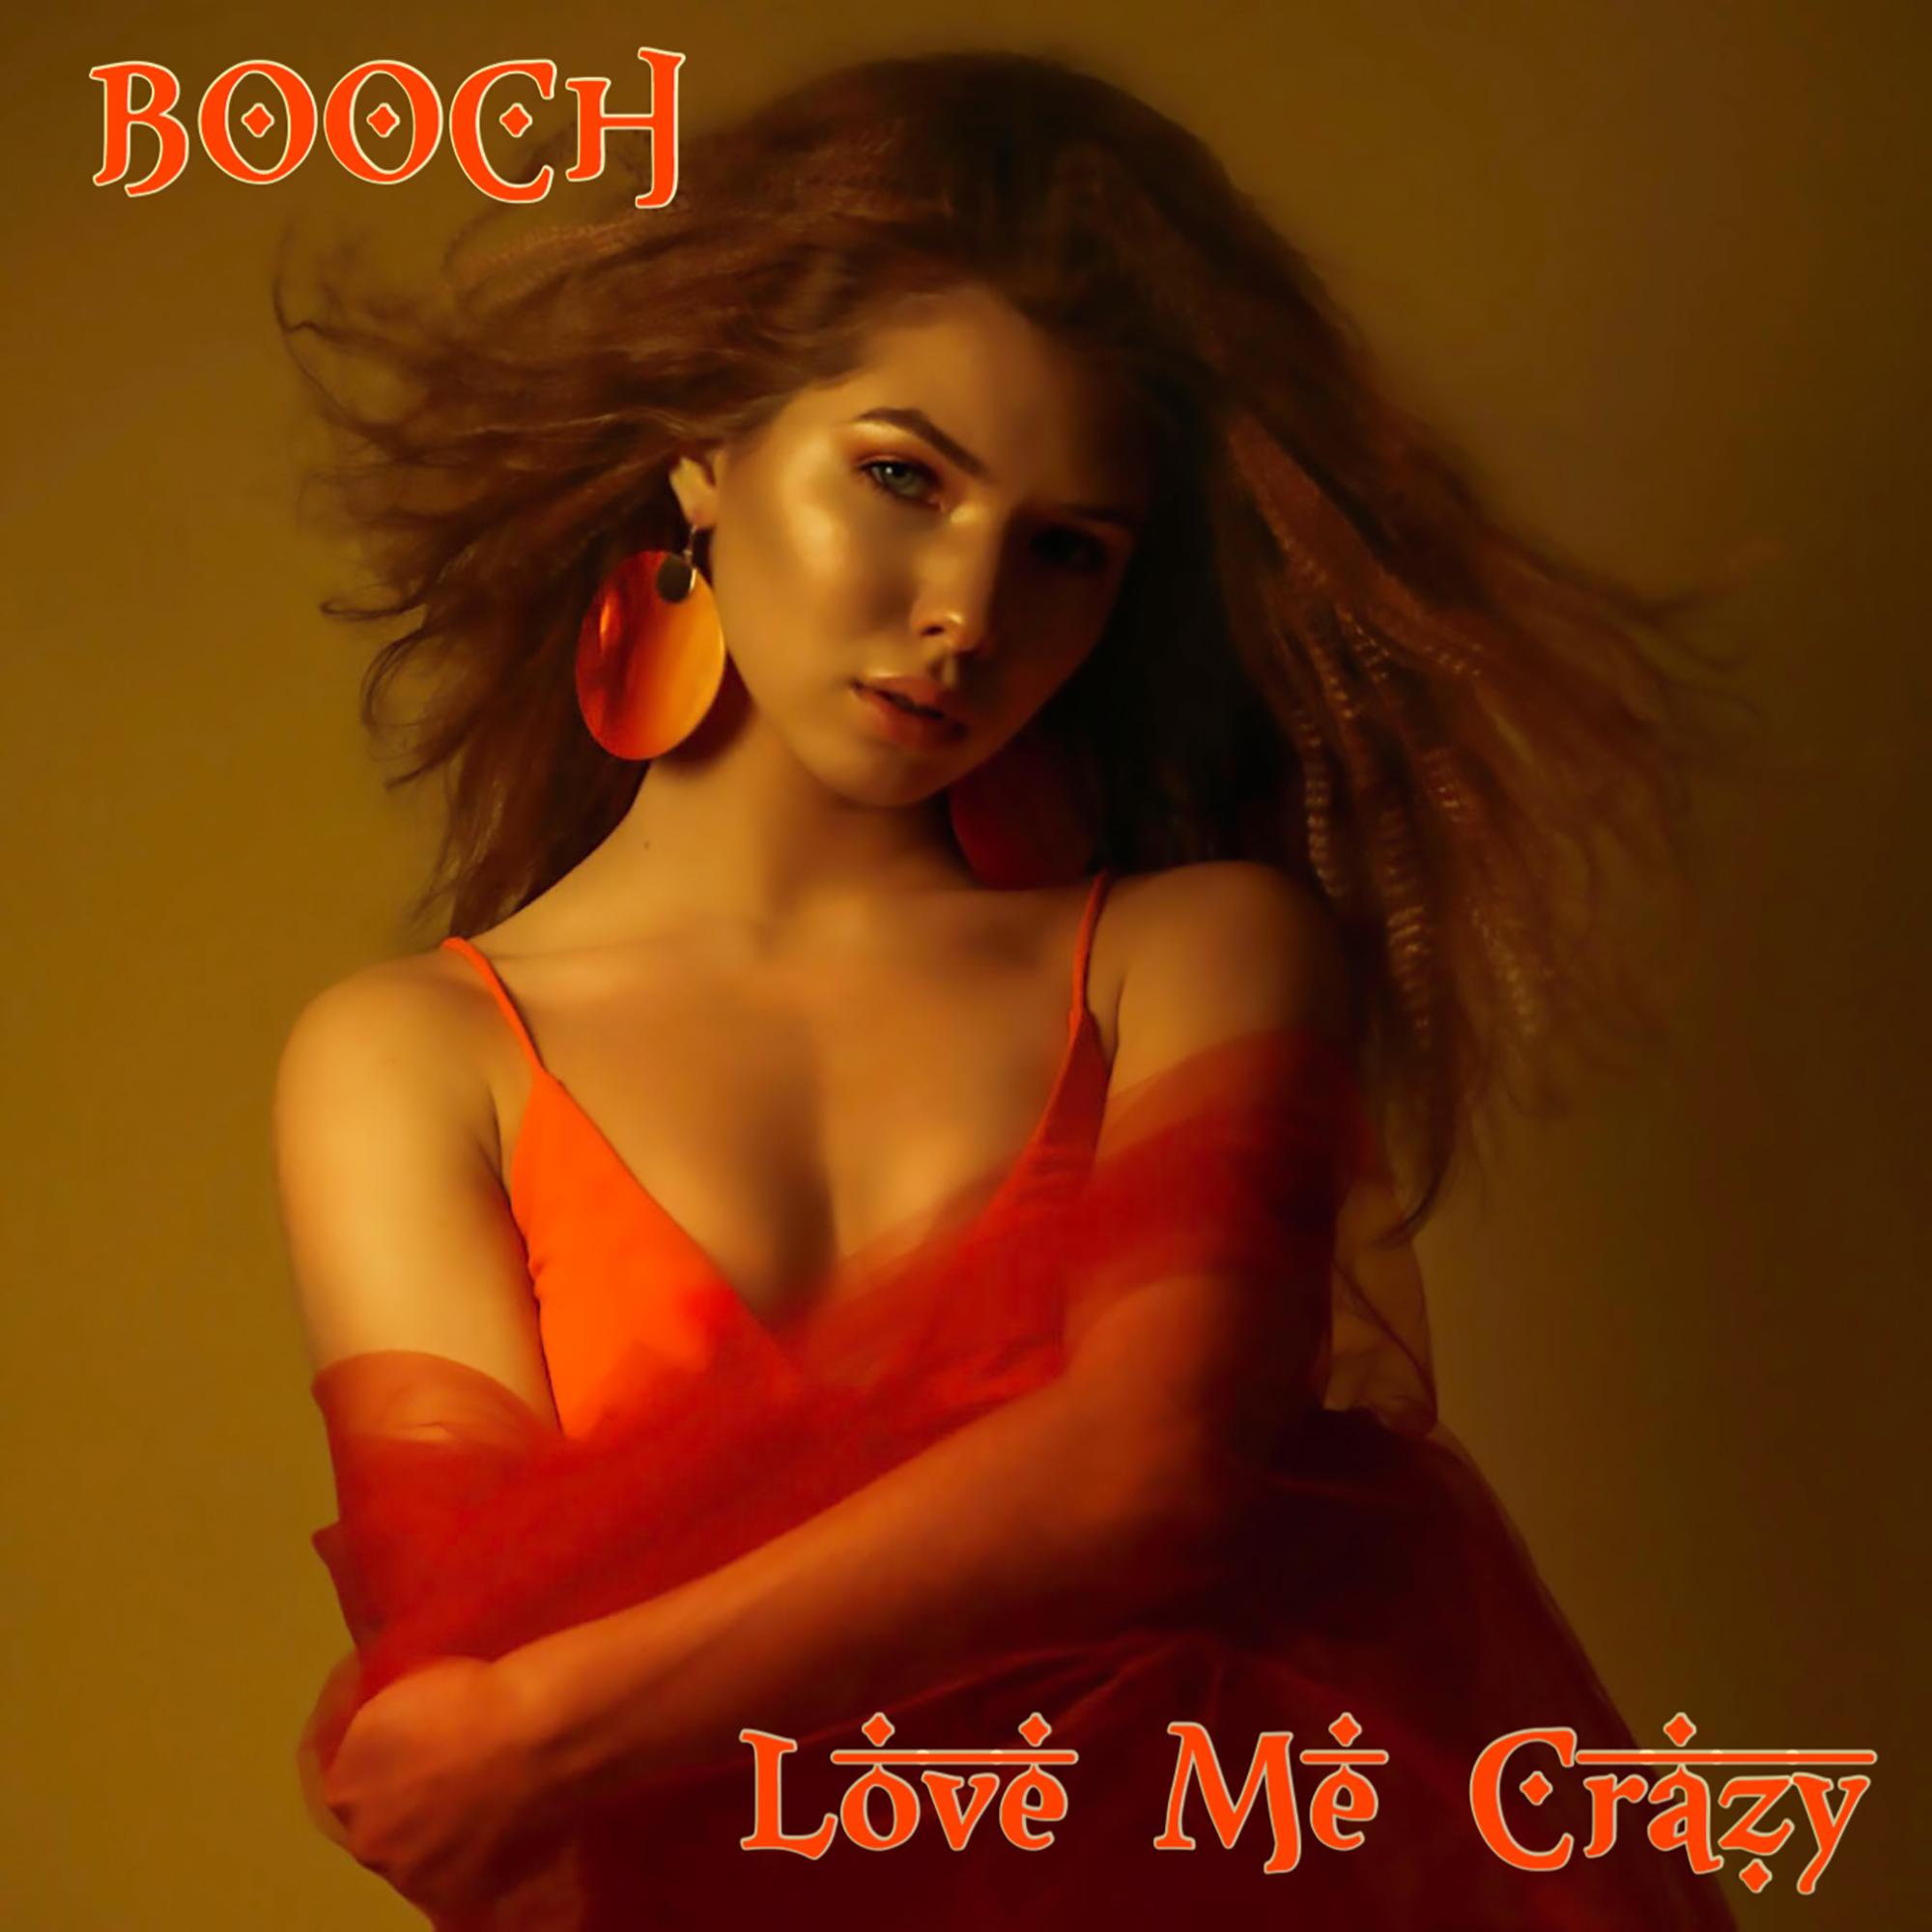 Booch - Love Me Crazy - Clean Single - Final photo.jpg